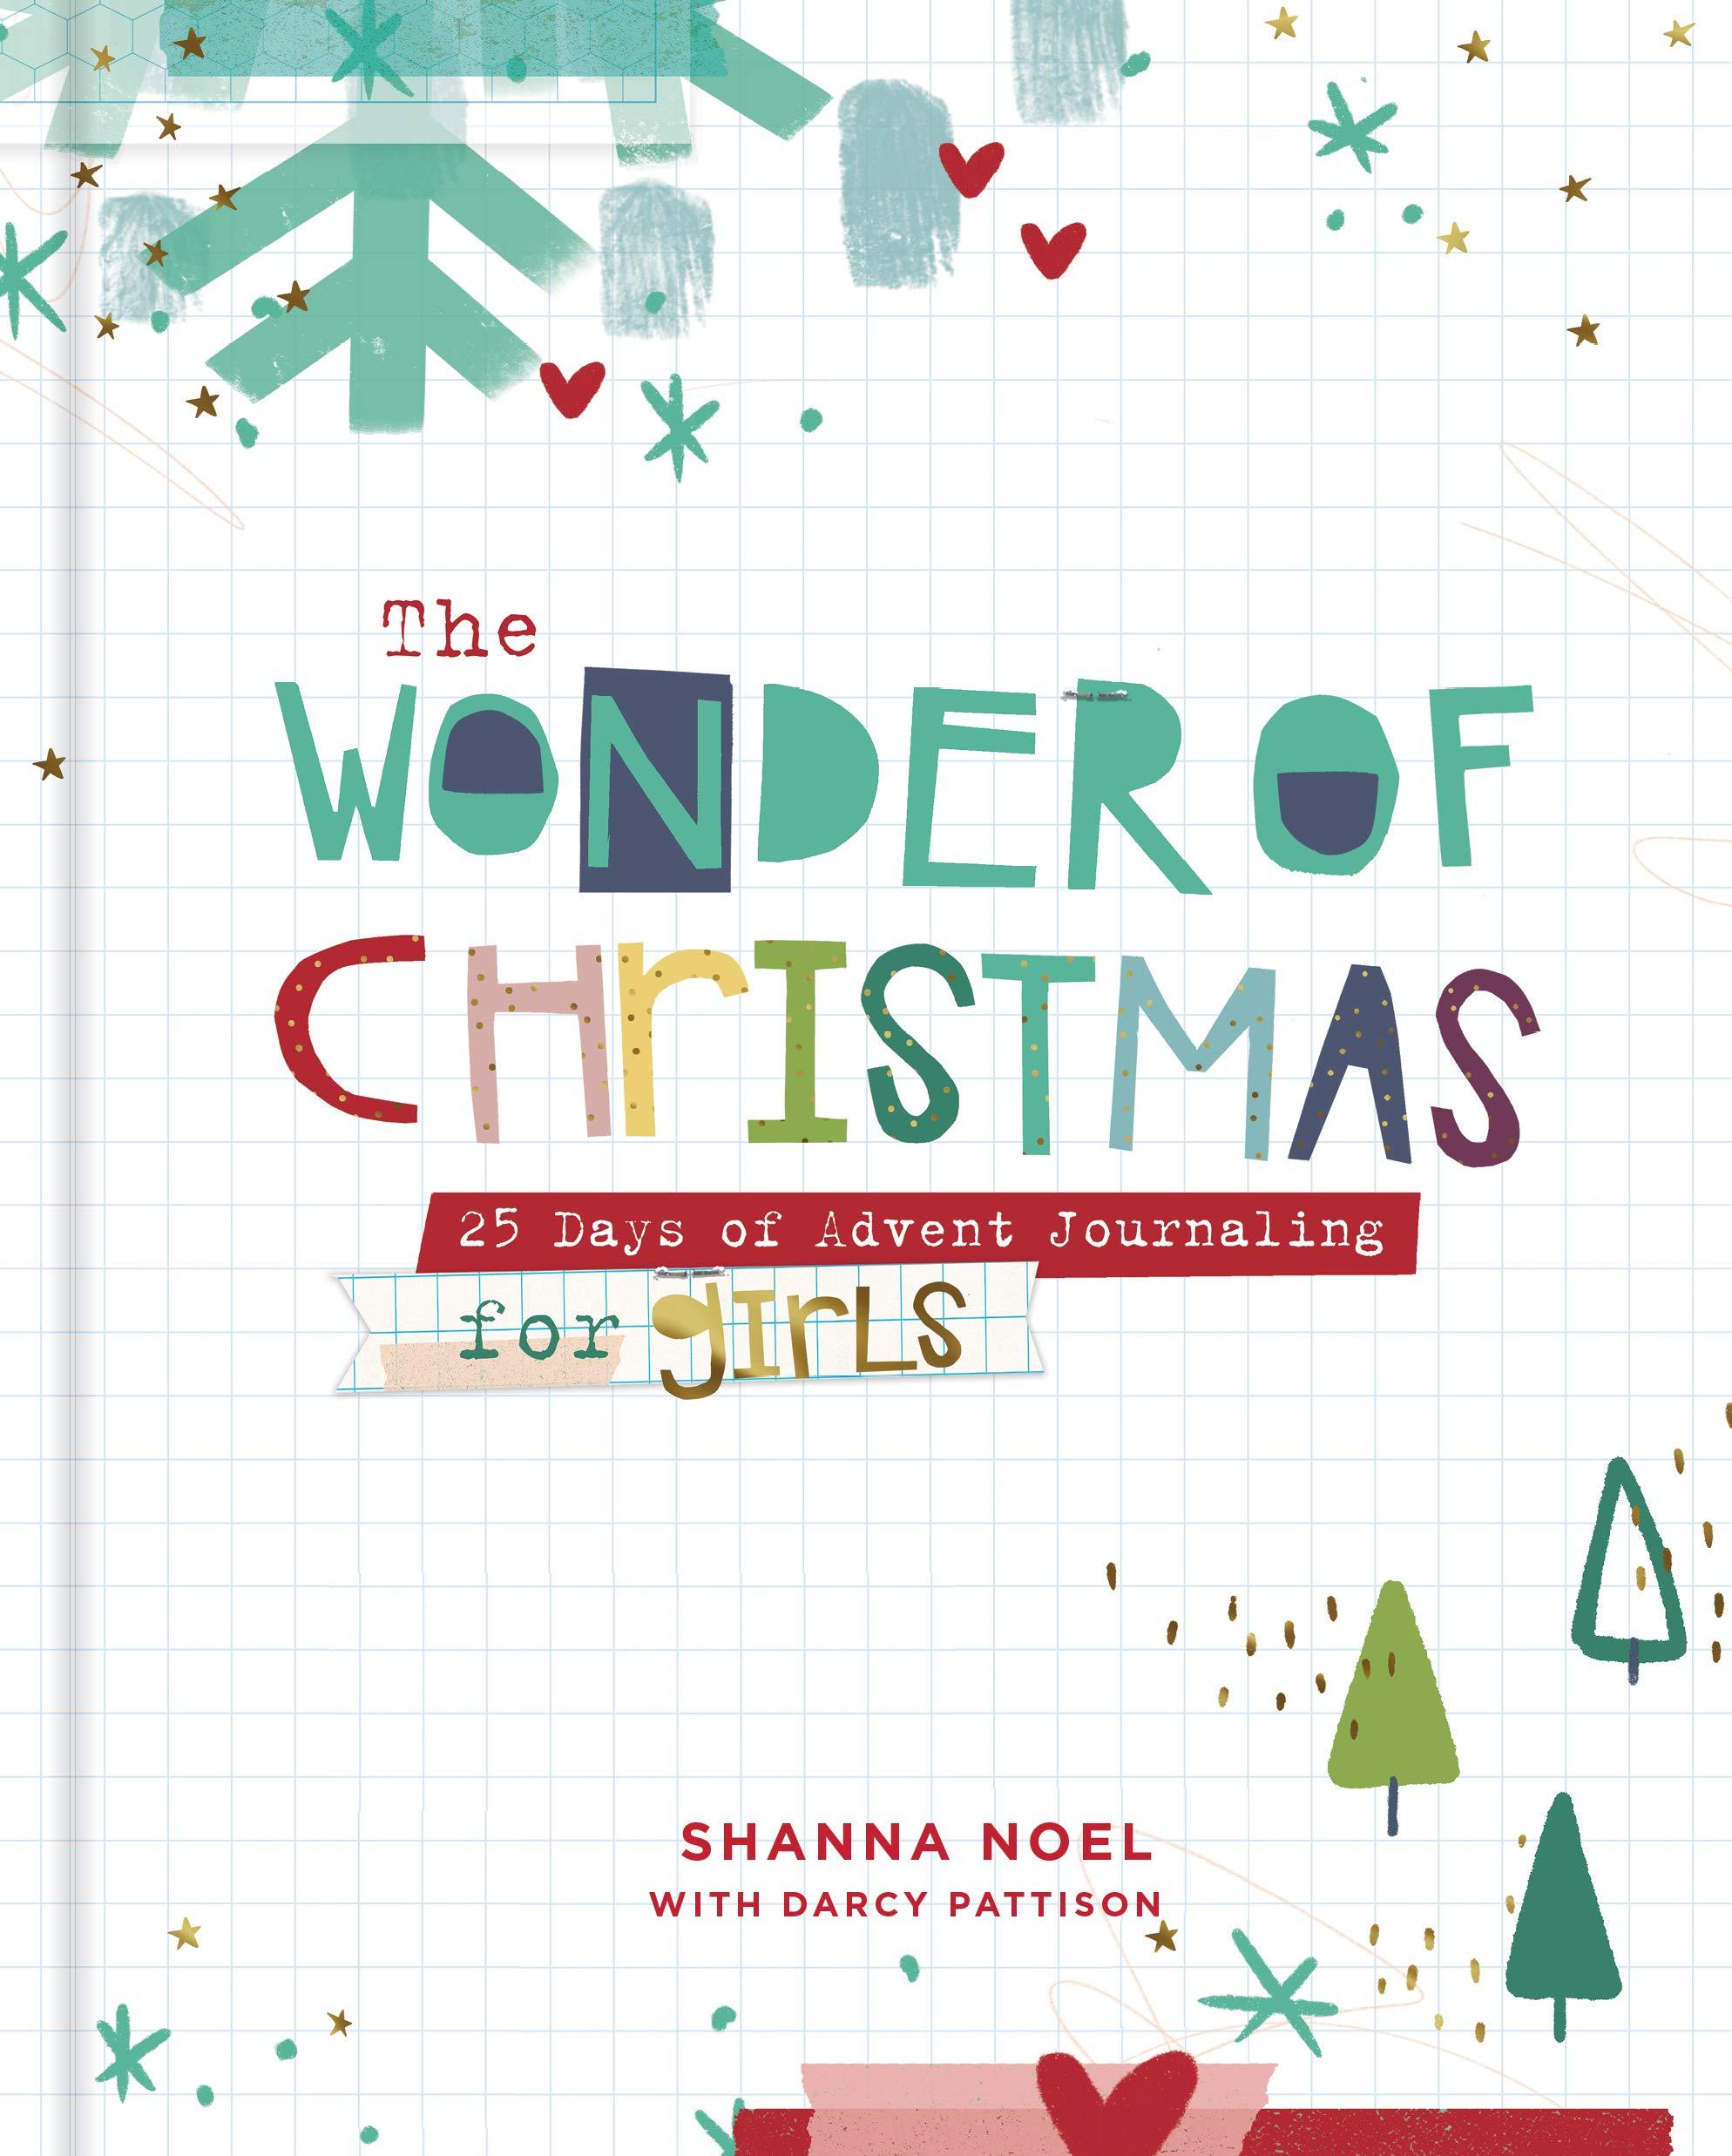 25 Days Of Christmas 2019.Amazon Com The Wonder Of Christmas 25 Days Of Advent